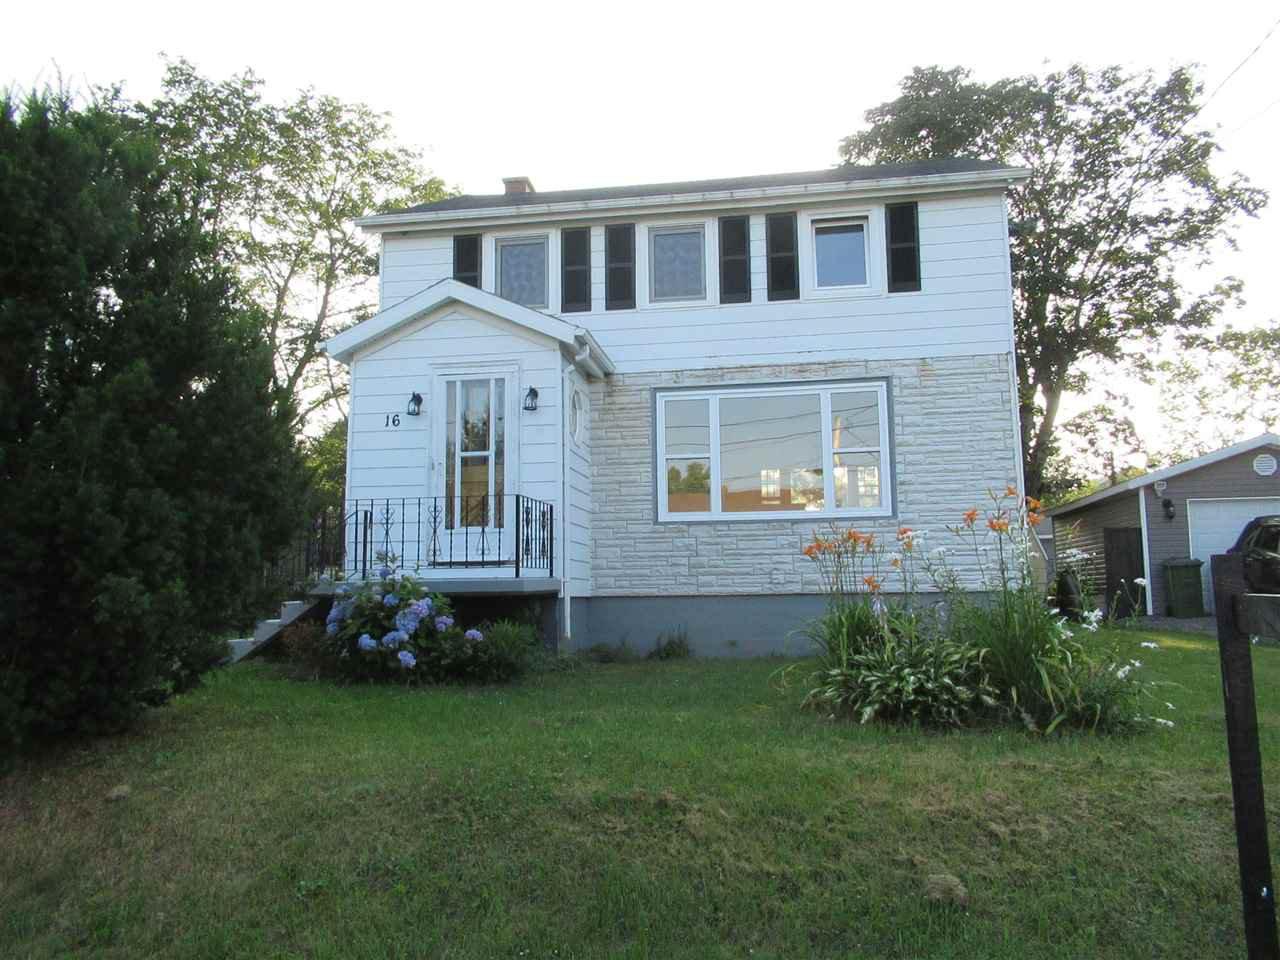 Main Photo: 16 Moulton Avenue in North Sydney: 205-North Sydney Residential for sale (Cape Breton)  : MLS®# 202014549